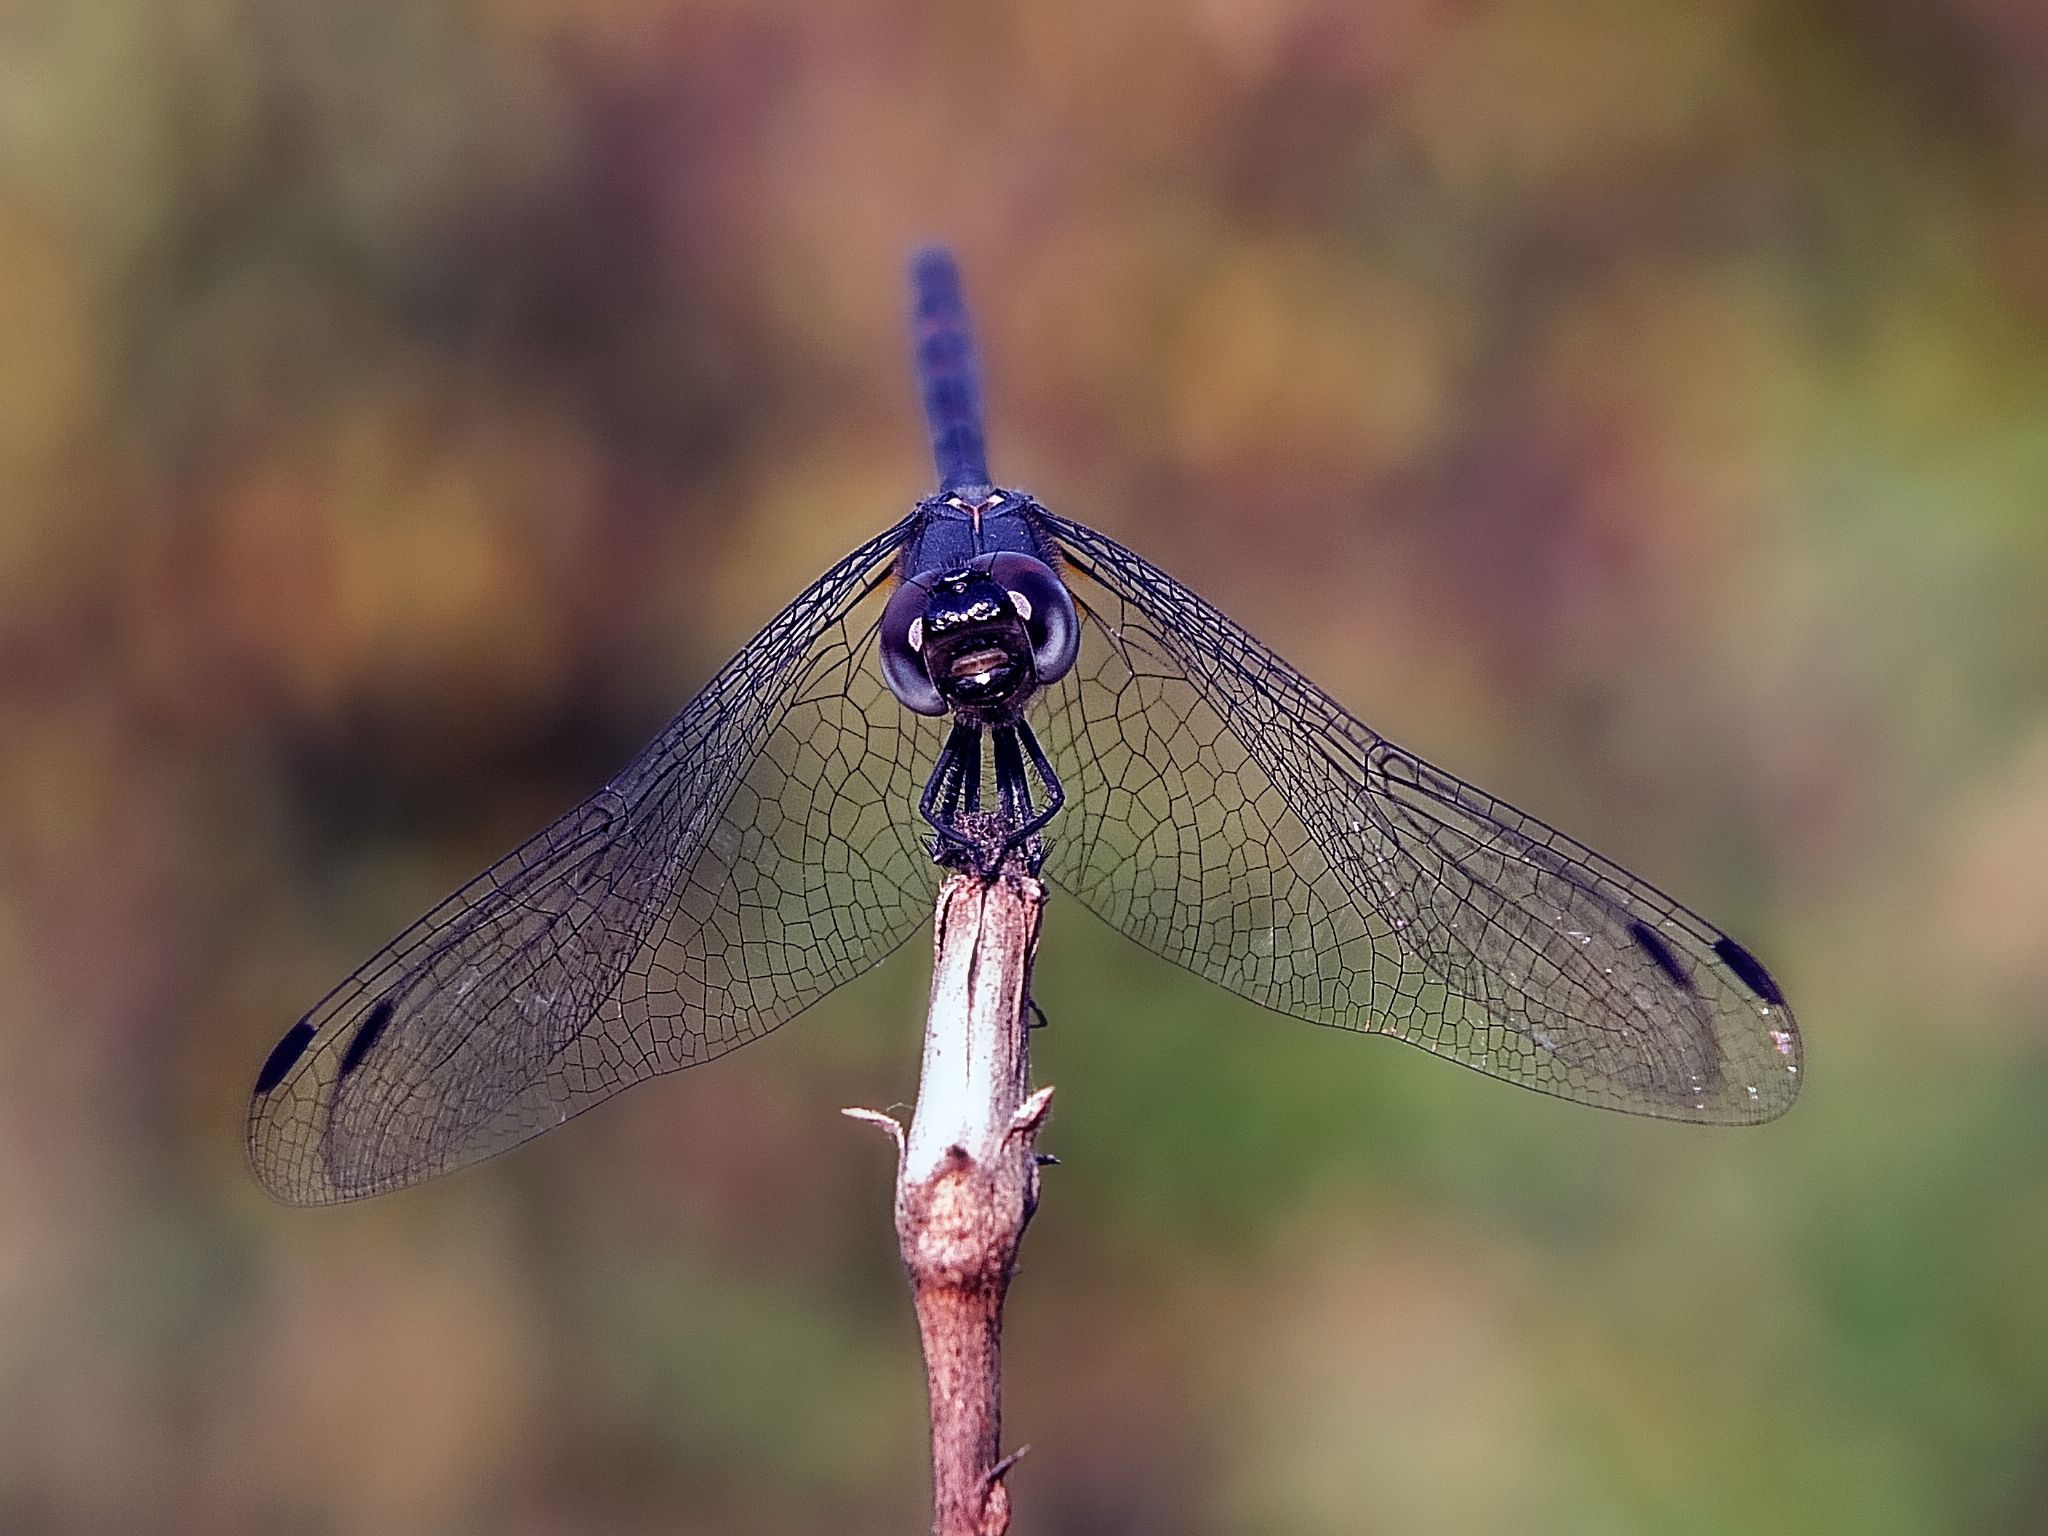 Black Dragonfly  by kayhan.ozcicek